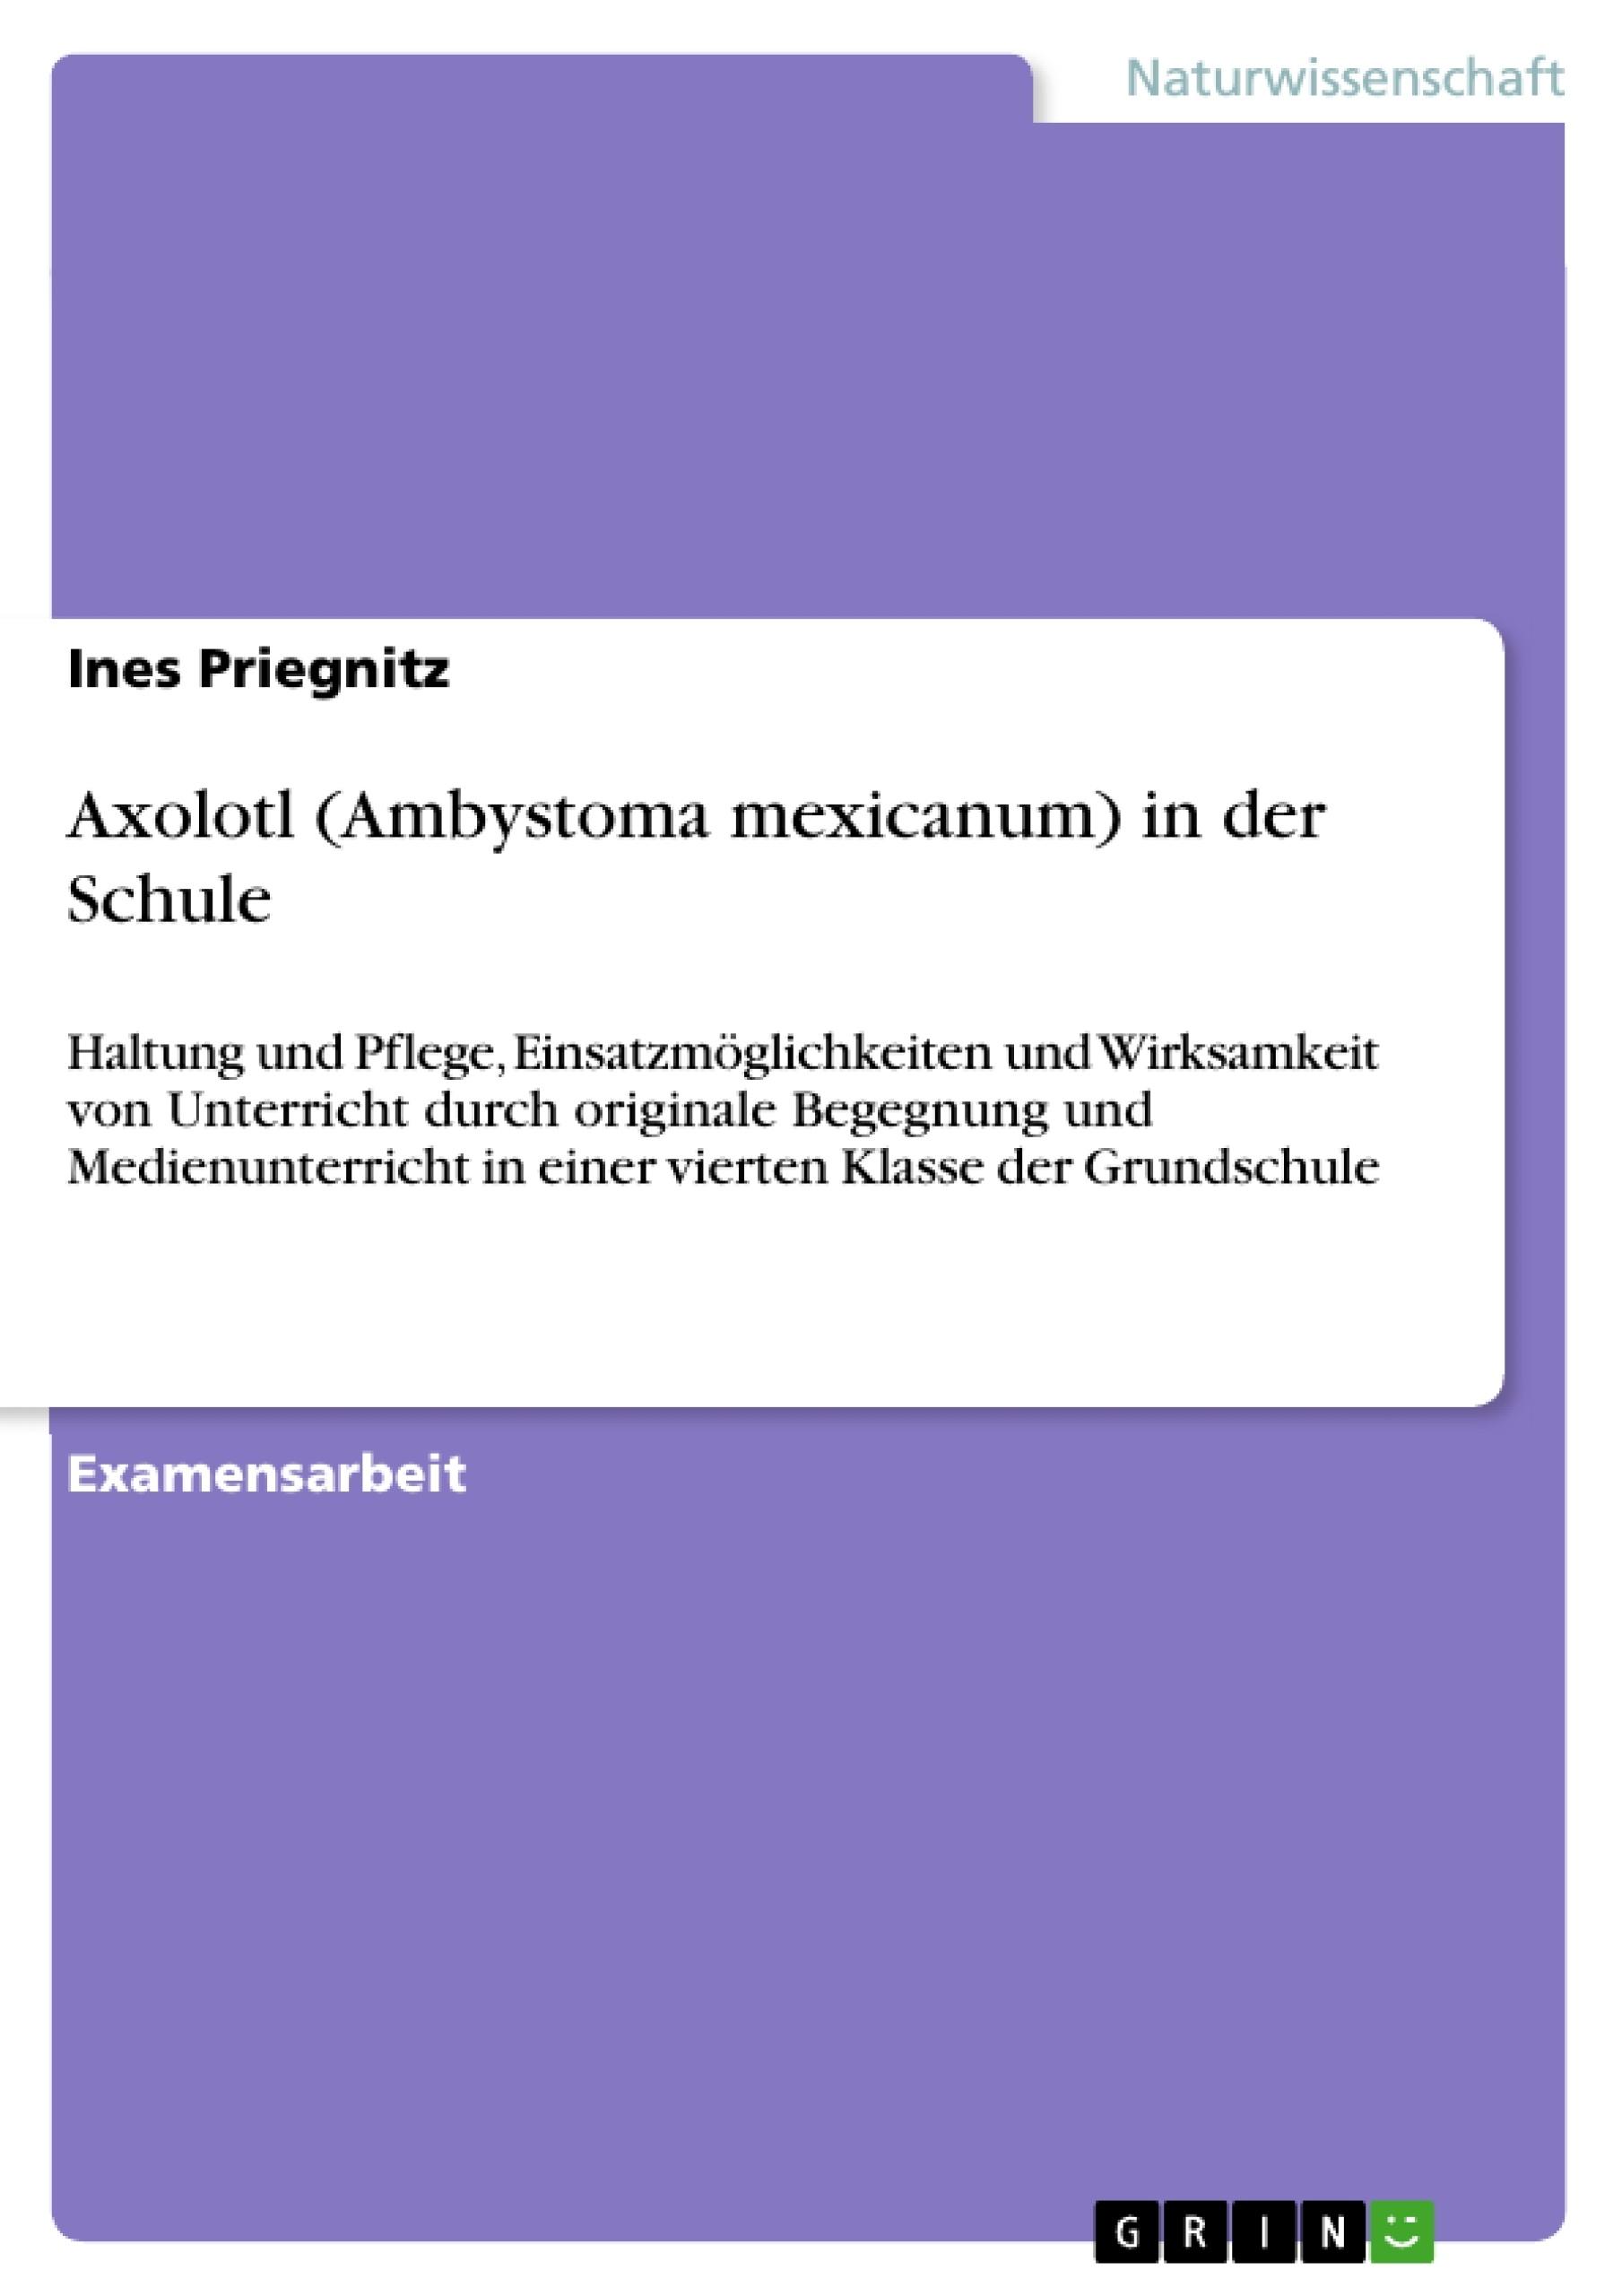 Titel: Axolotl (Ambystoma mexicanum) in der Schule